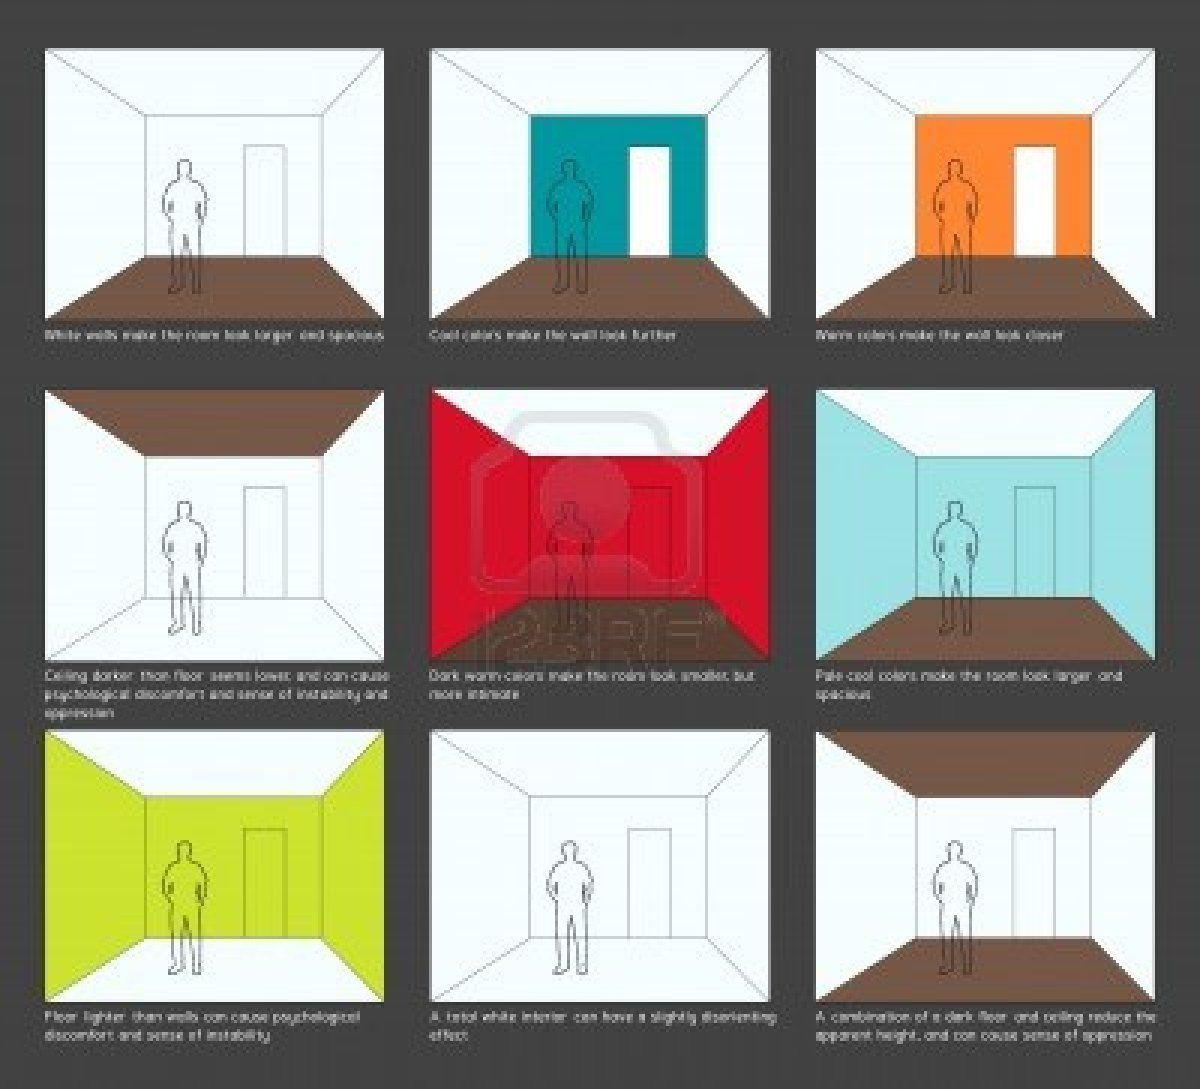 Fred Griffin Art Griffin Design Code Graphic Design Lessons Learning Graphic Design Composition Design